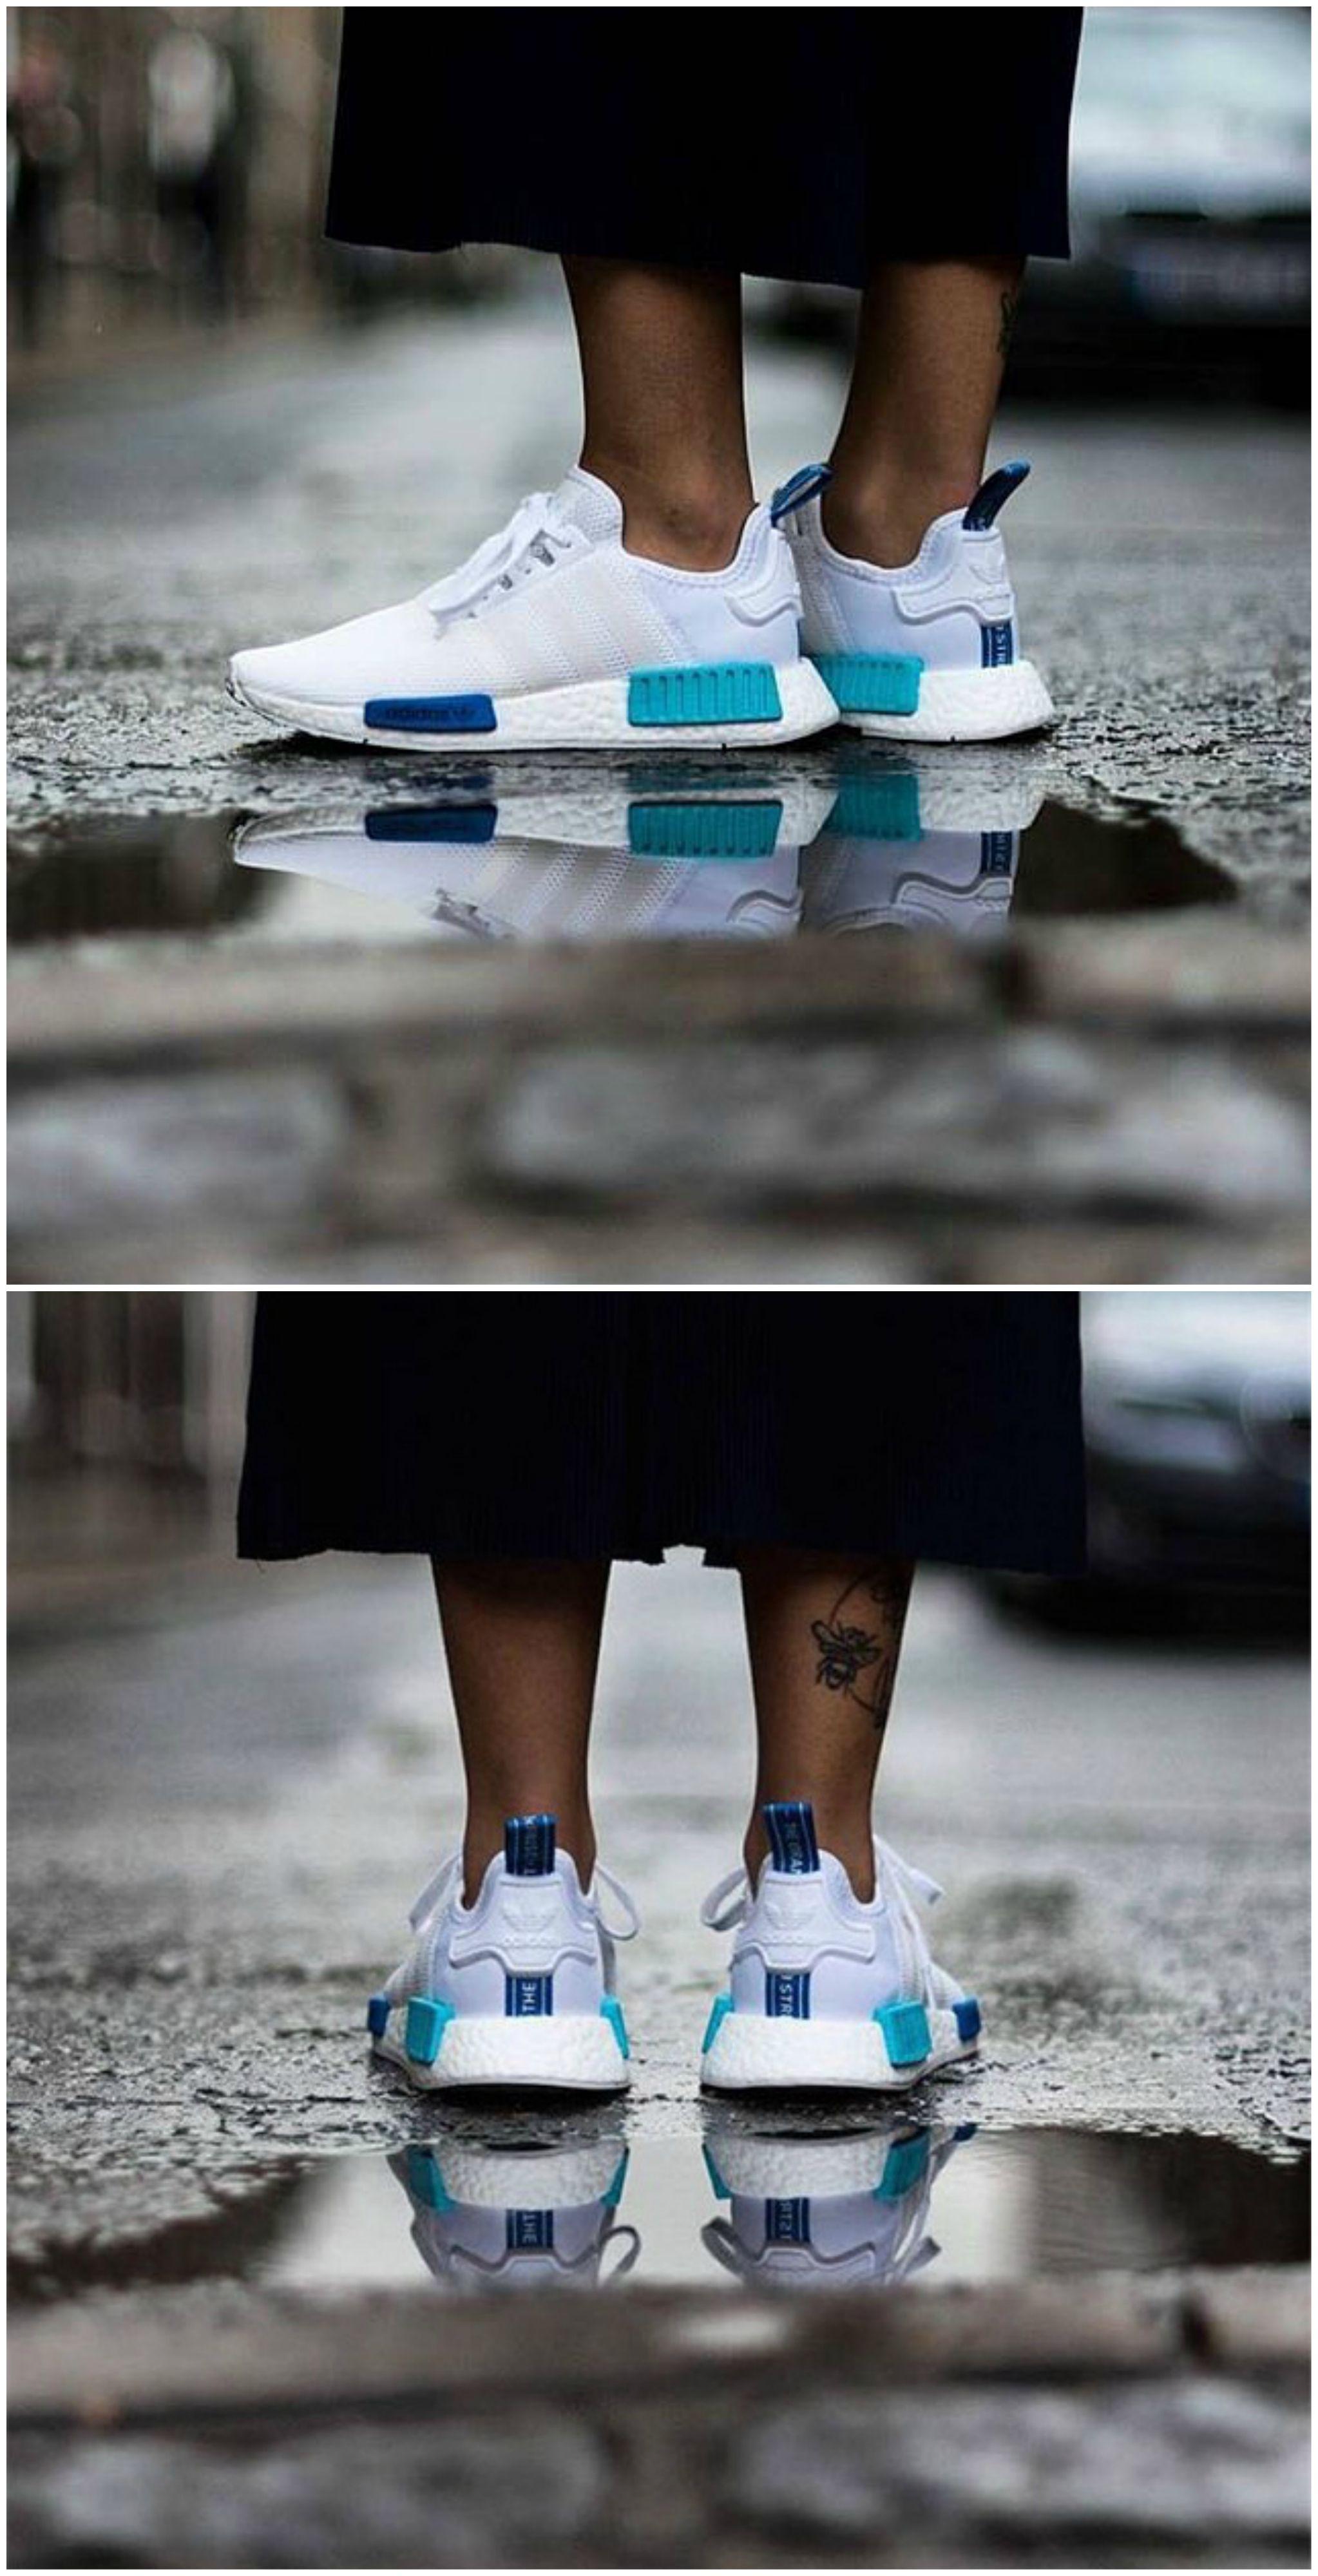 Adidas NMD Primeknit Tricolor, Men's Fashion, Footwear